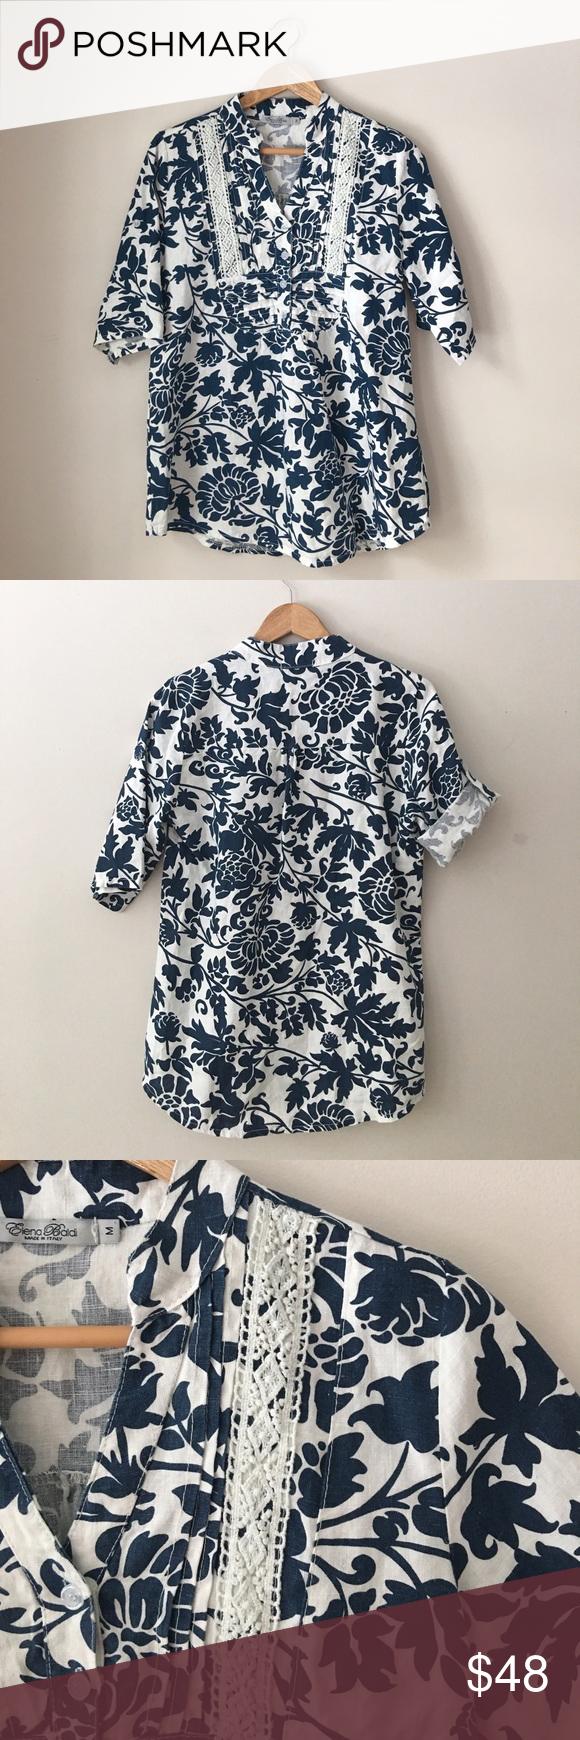 6eeb3a8f033cfd Elena Baldi Navy + White Linen Tunic Beautiful tropical Linen tunic in navy  + white by